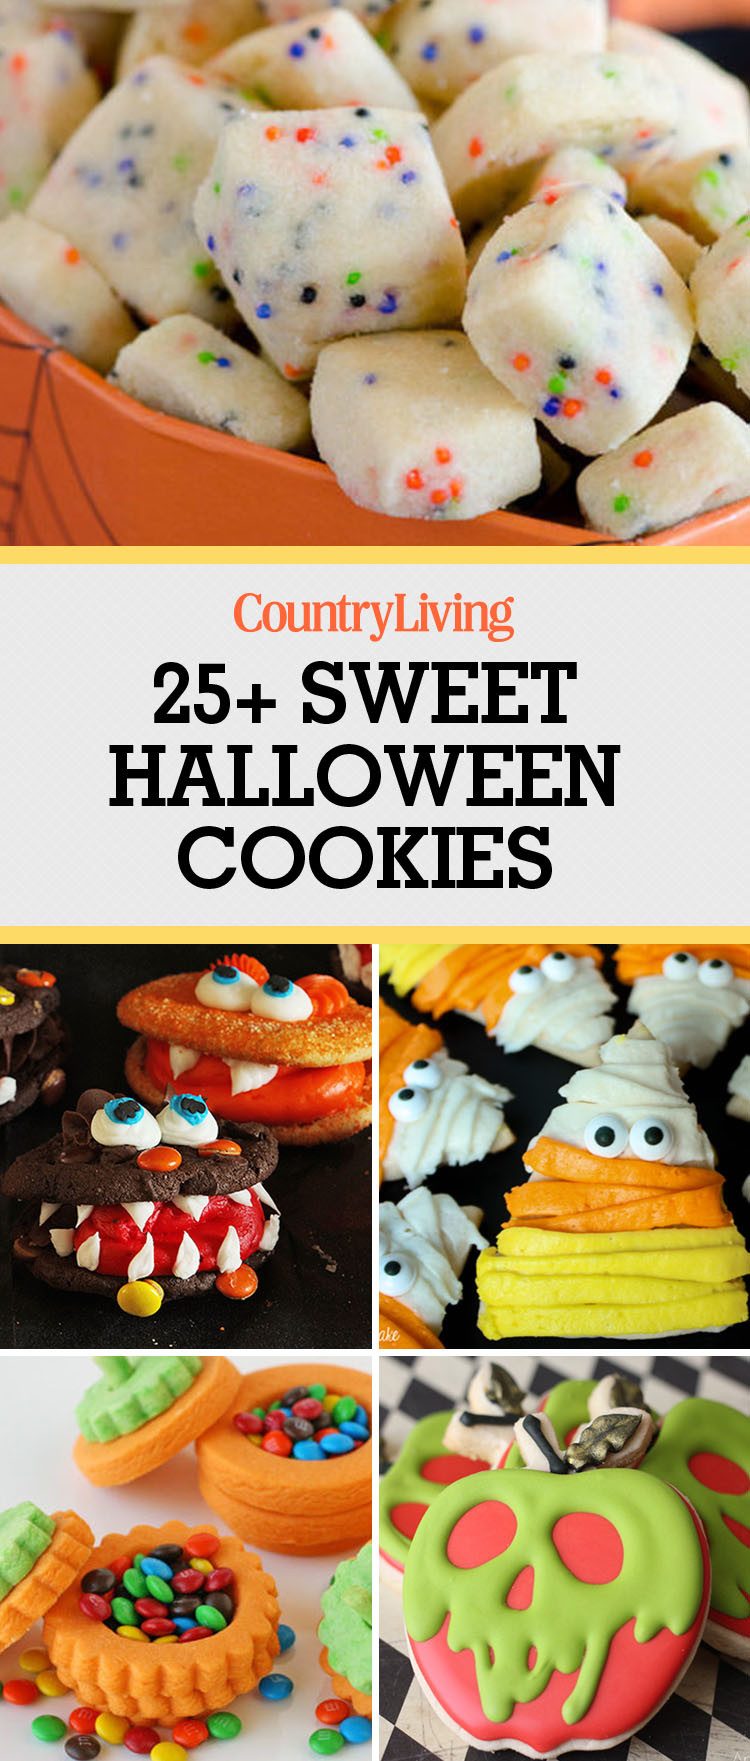 Easy Halloween Cookies  31 Easy Halloween Cookies Recipes & Ideas for Cute